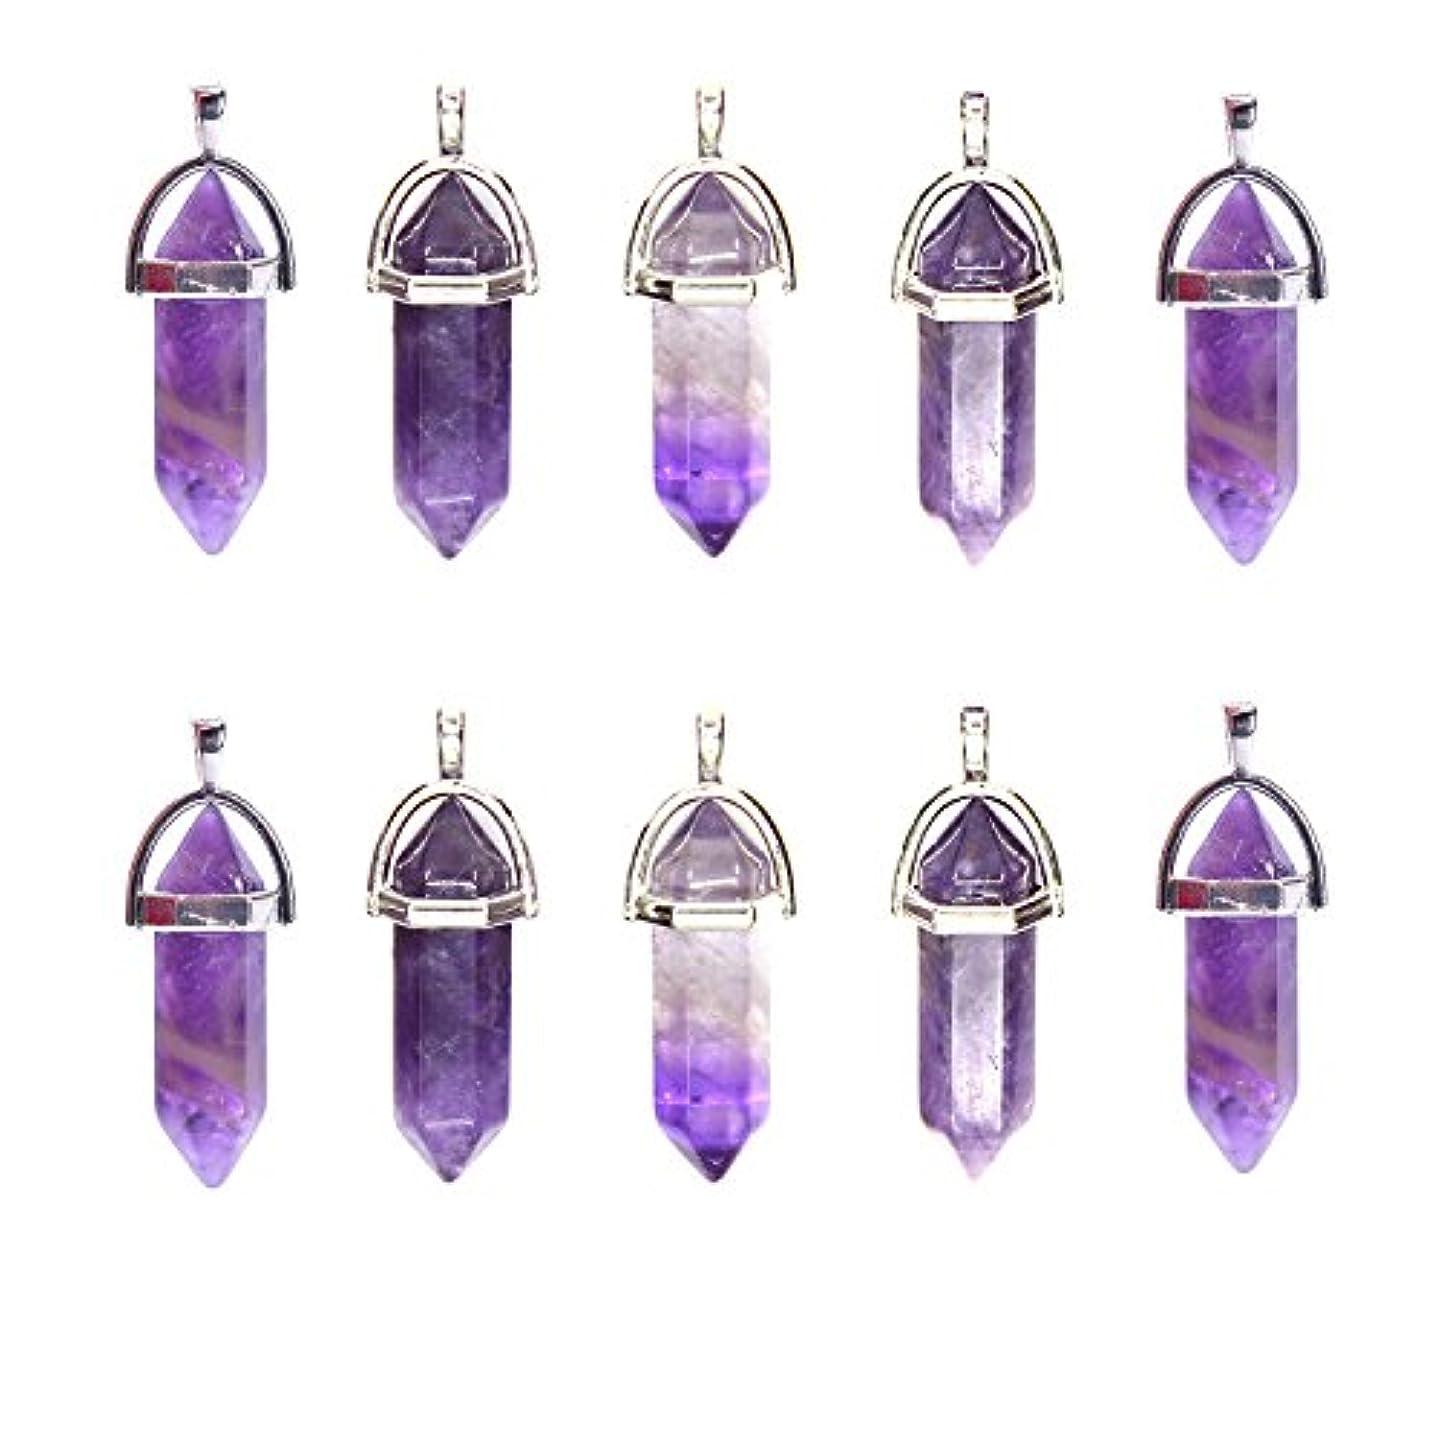 Wholesale 10PCS Amethyst Genuine Quartz Stone Healing Point Reiki Chakra Pendants Charms Bulk for Jewelry Making